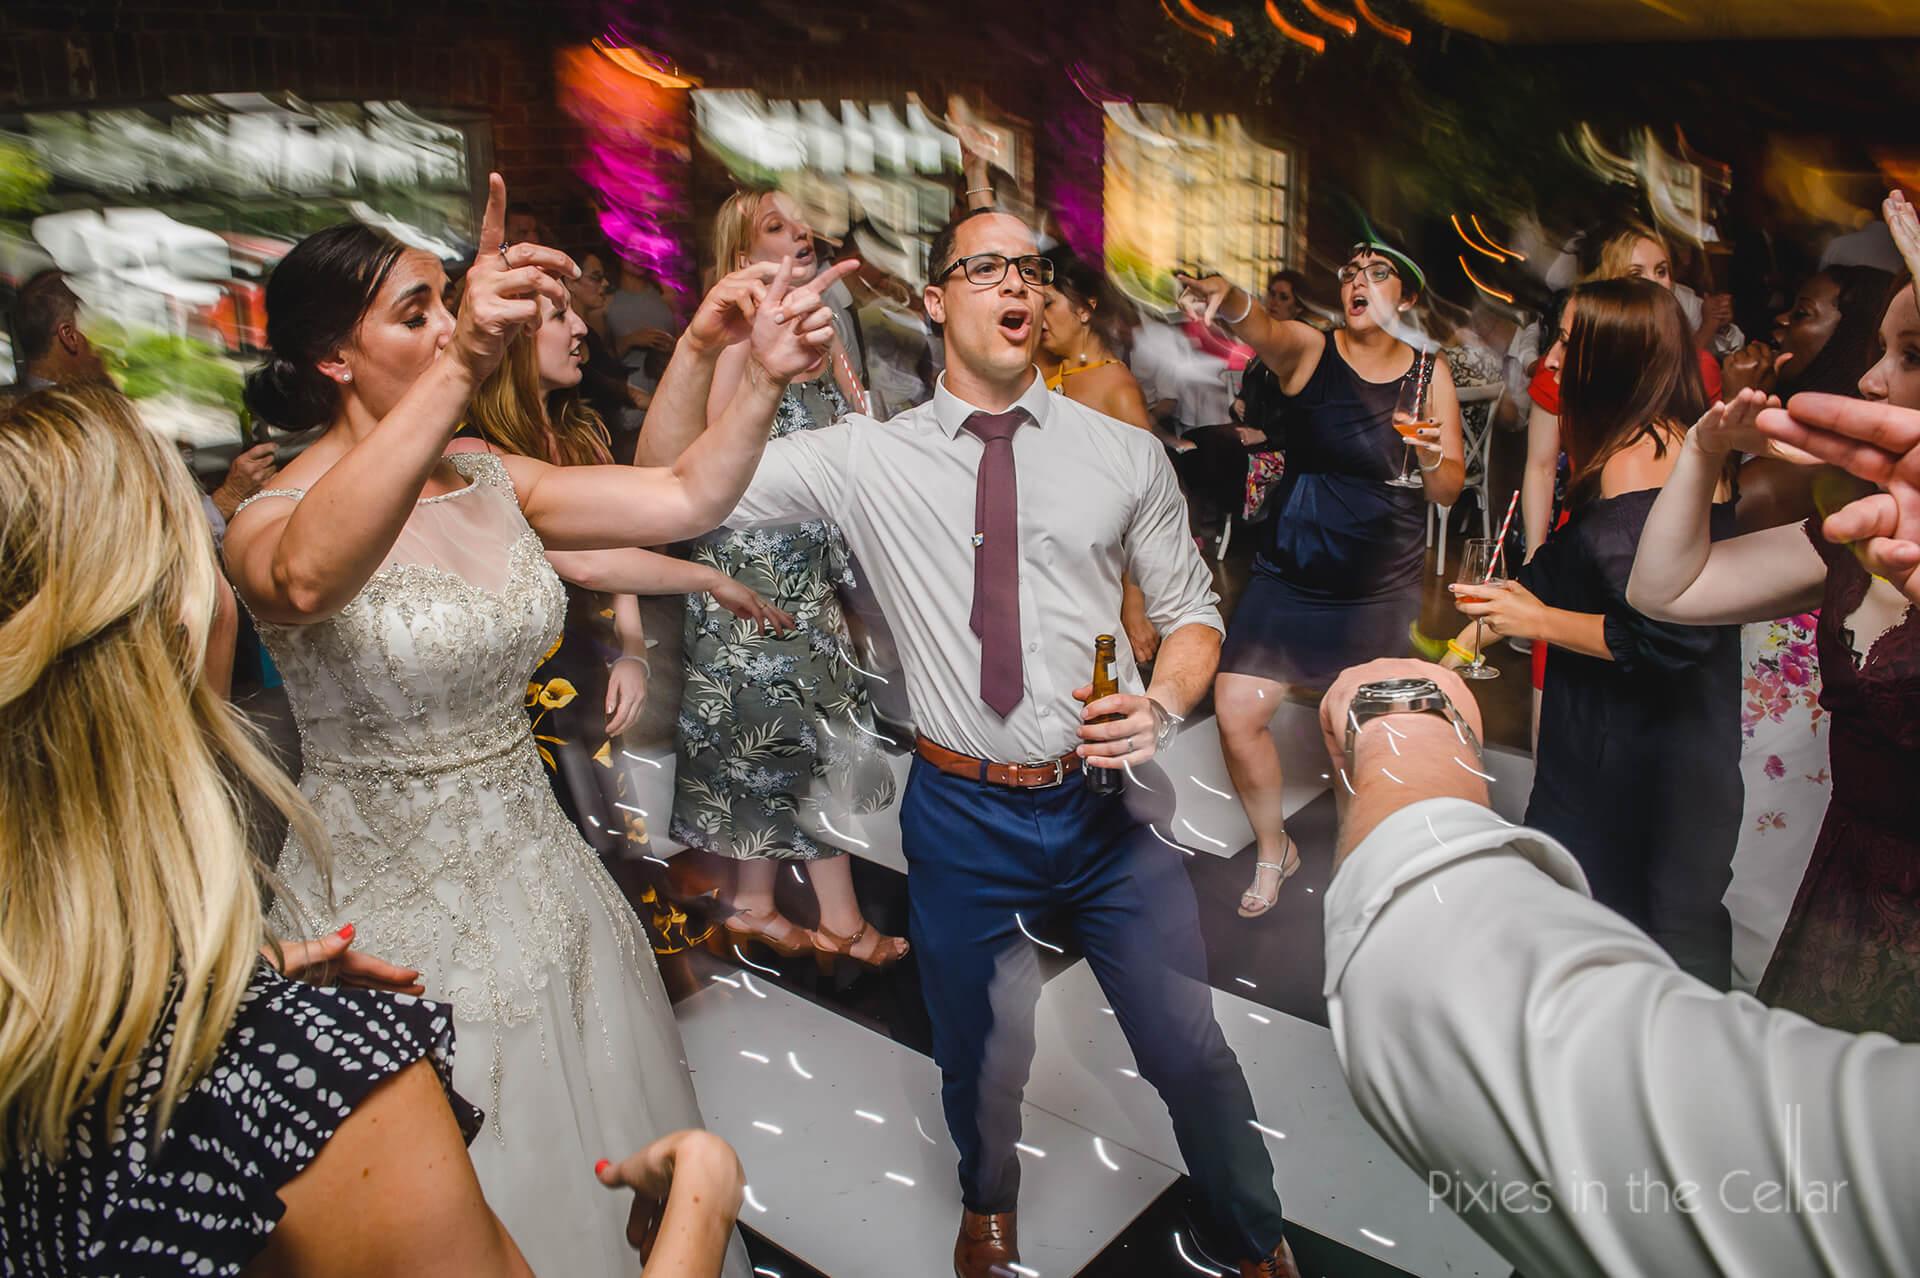 Guests partying on the dancefloor